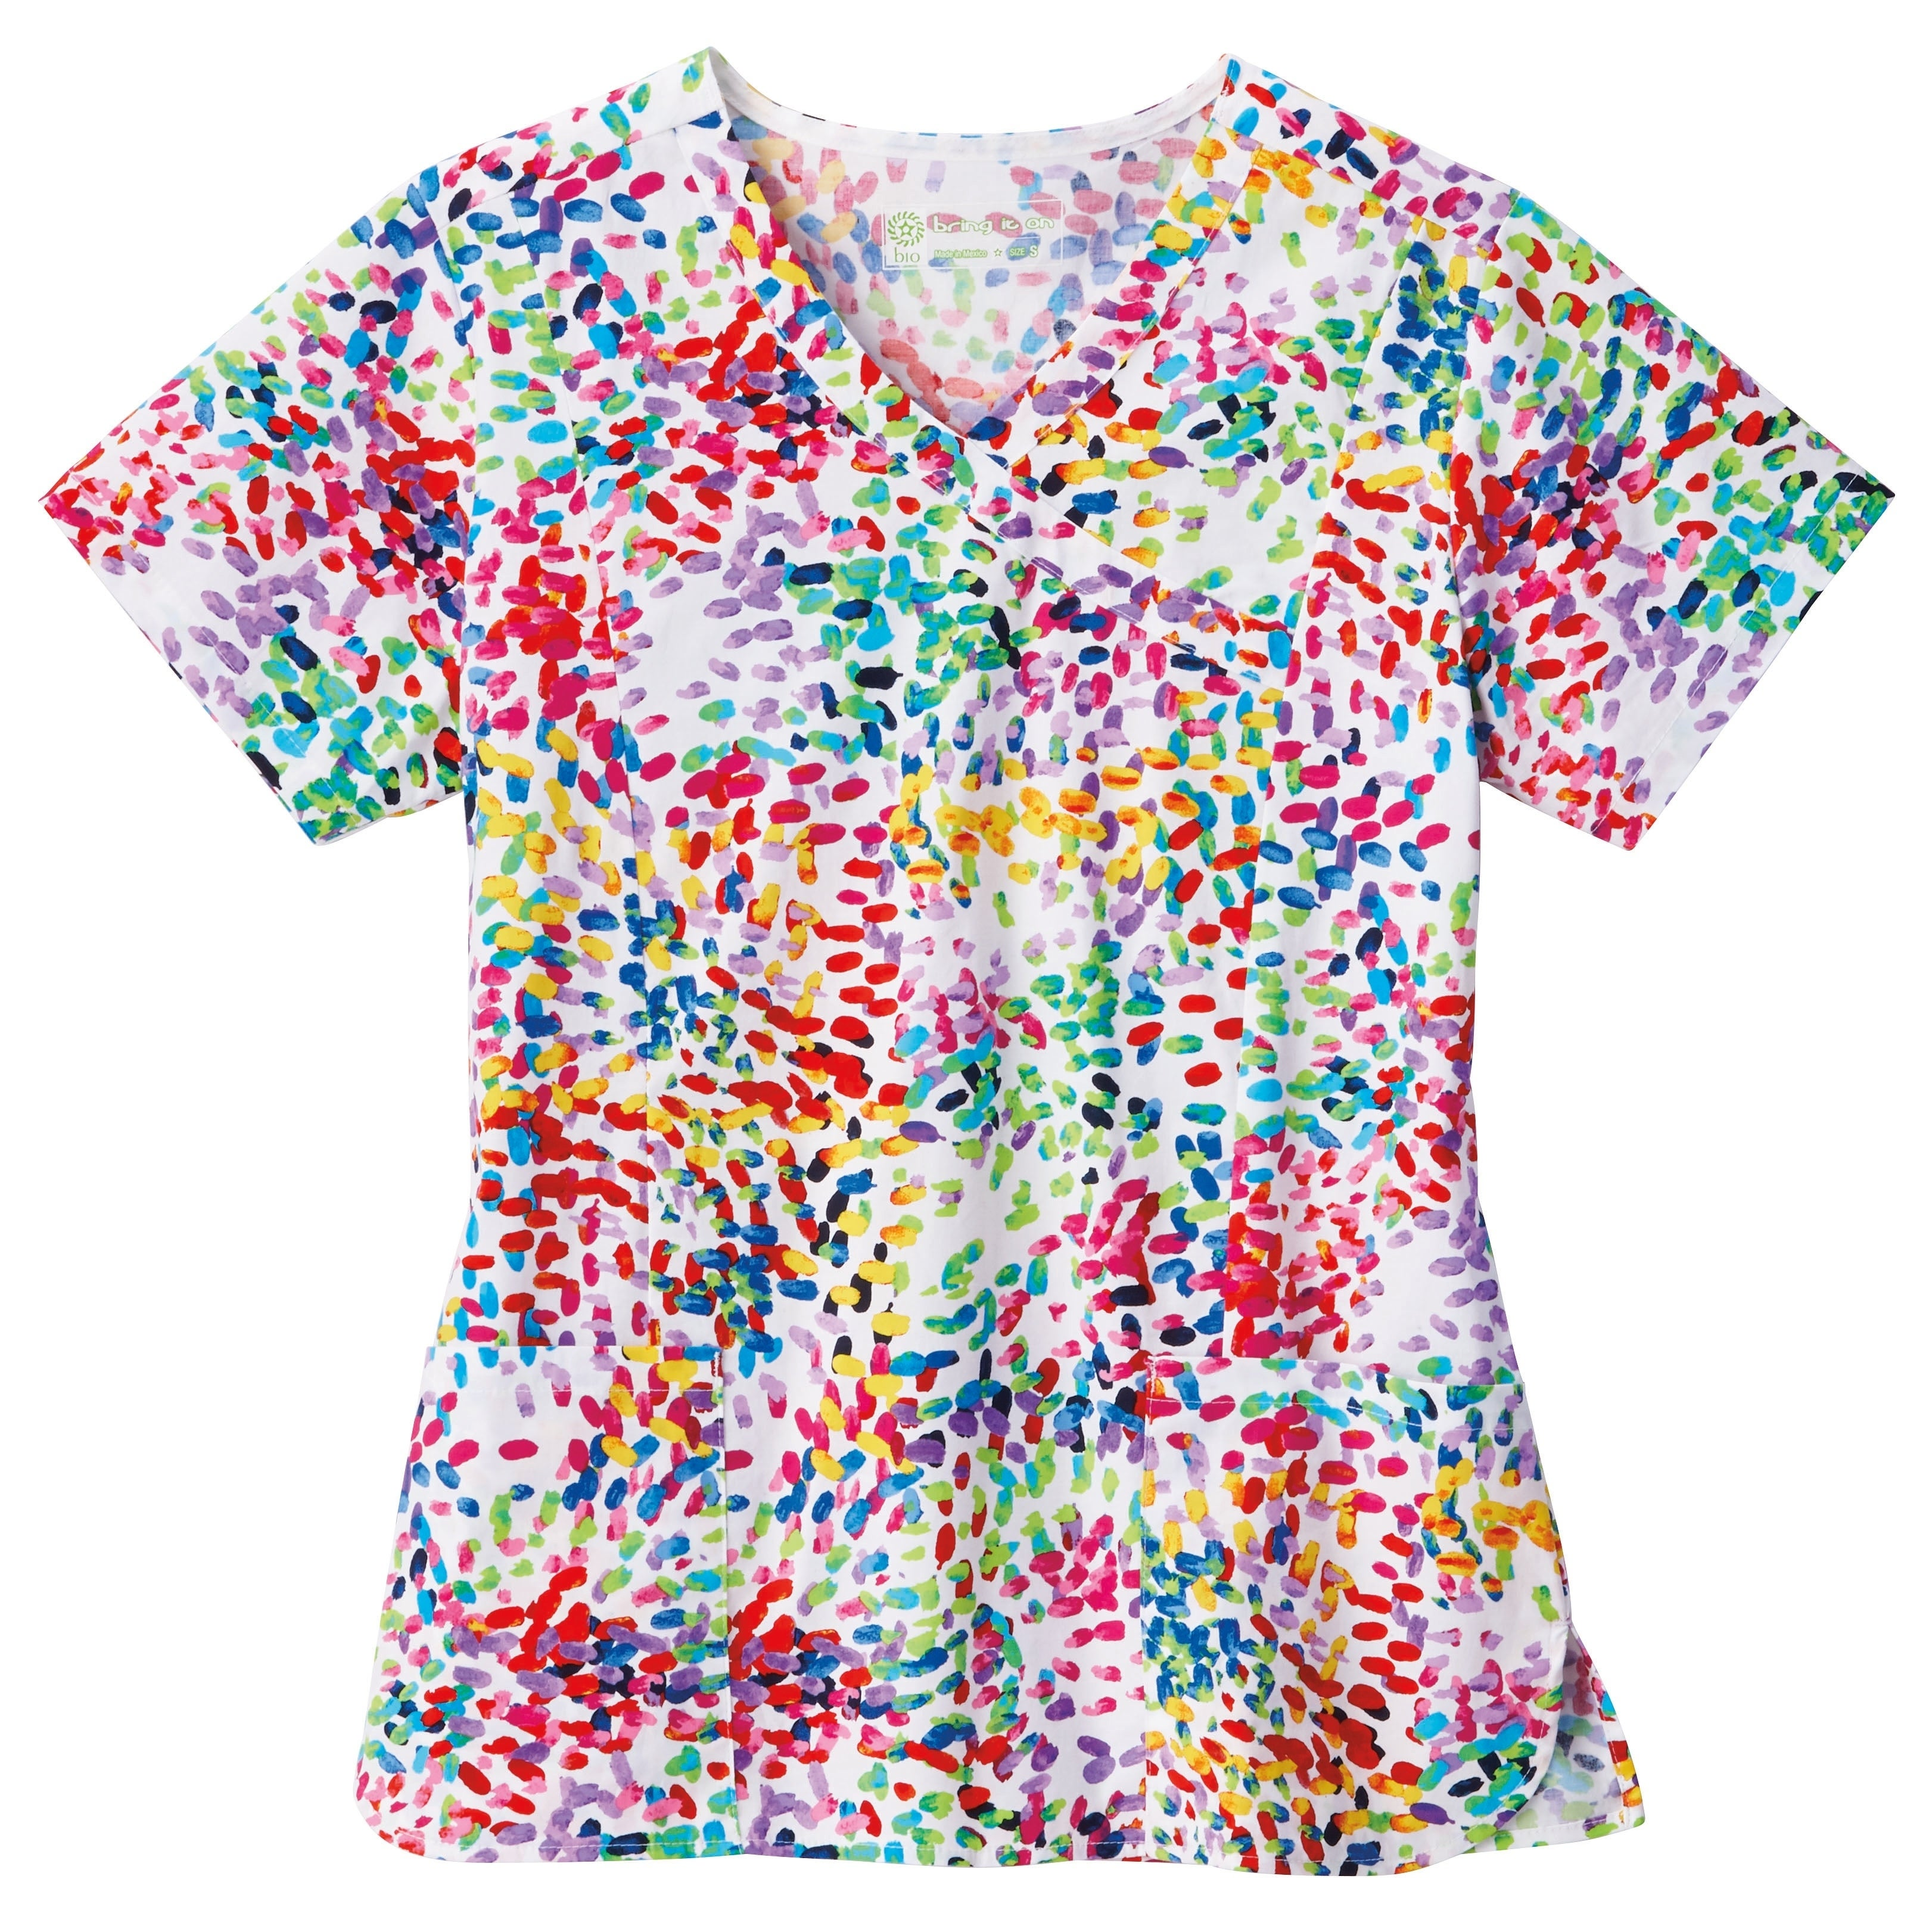 b7ea596b642 Shop BIO Print Ladies Mock Wrap Scrub Top - Free Shipping On Orders Over  $45 - Overstock - 24300539